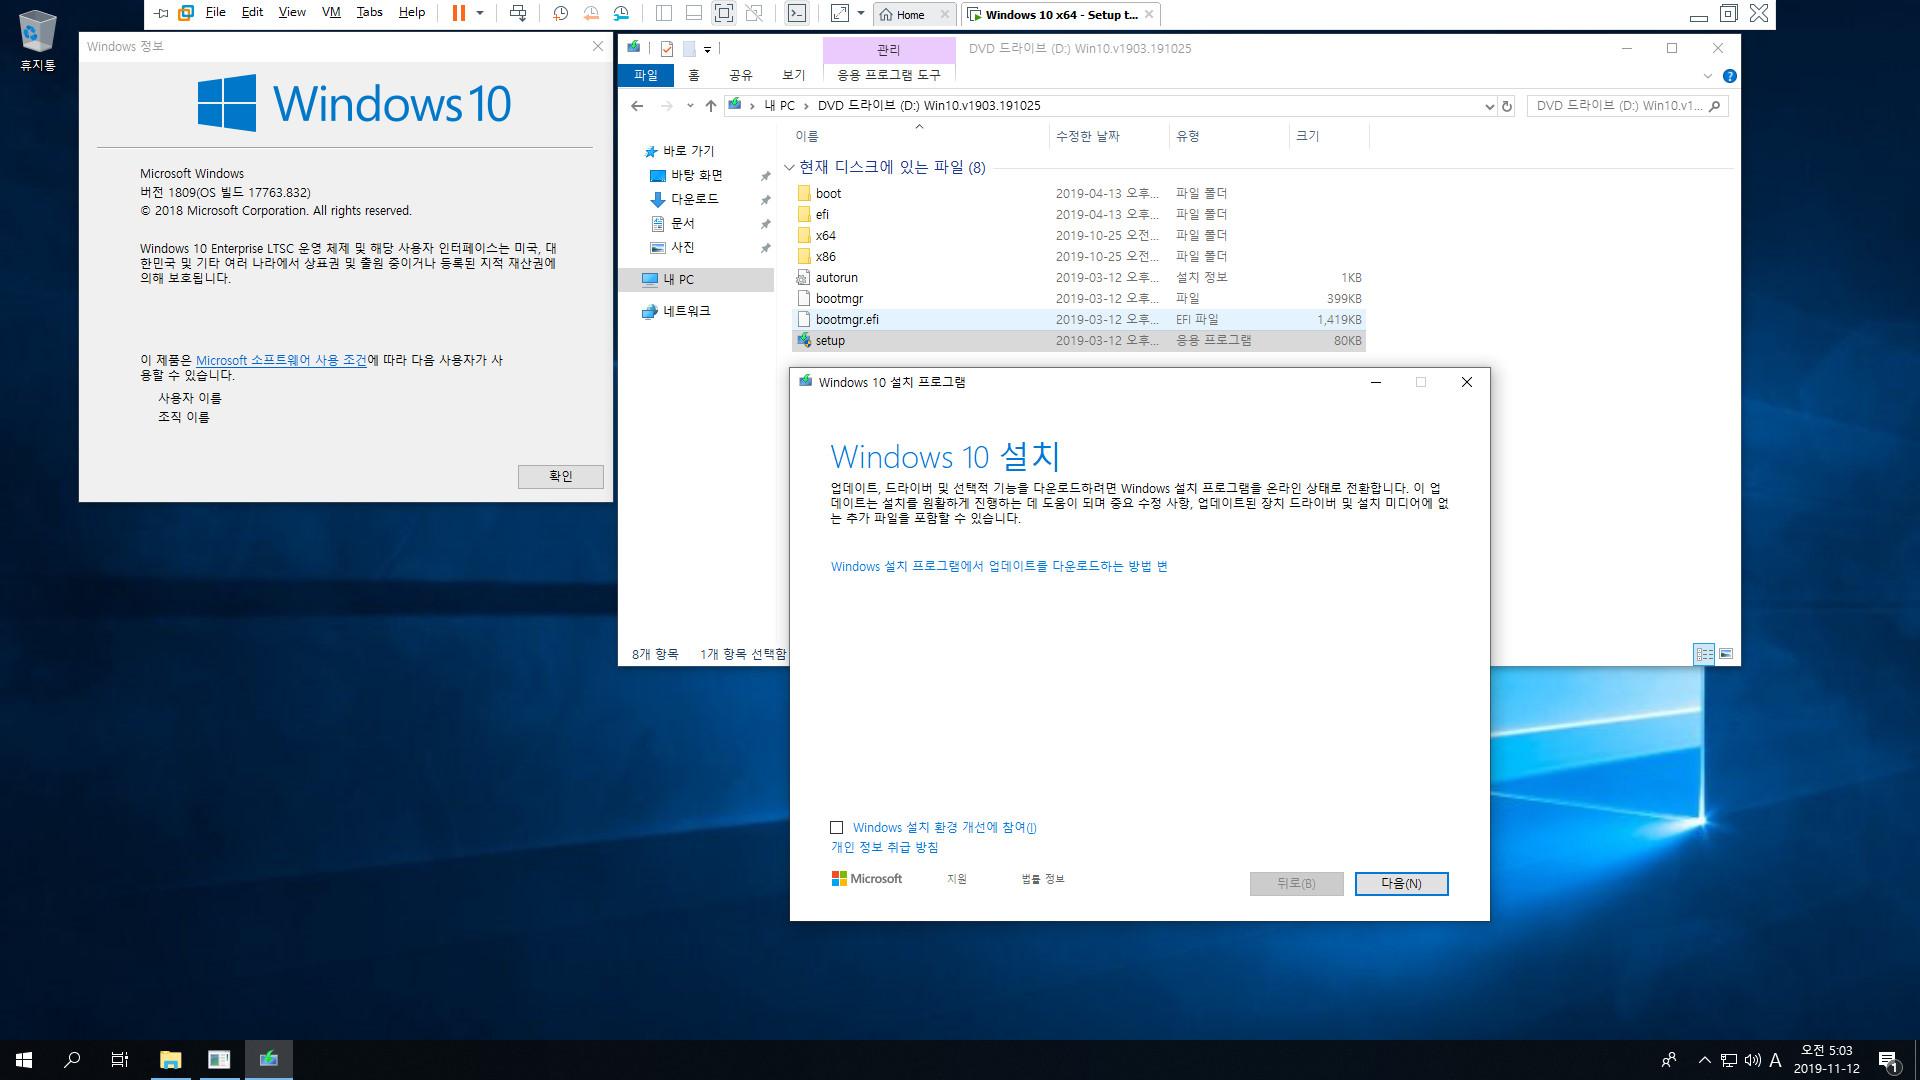 Windows 10 Enterprise LTSC [2019] (버전 1809) 를 버전 1903 프로로 업그레이드 설치하기 - 우선 설정과 앱 유지를 위해서 버전 1903 Enterprise로 업그레이드 한 후에 버전 1903 Pro로 변경하면 됩니다 2019-11-12_050323.jpg